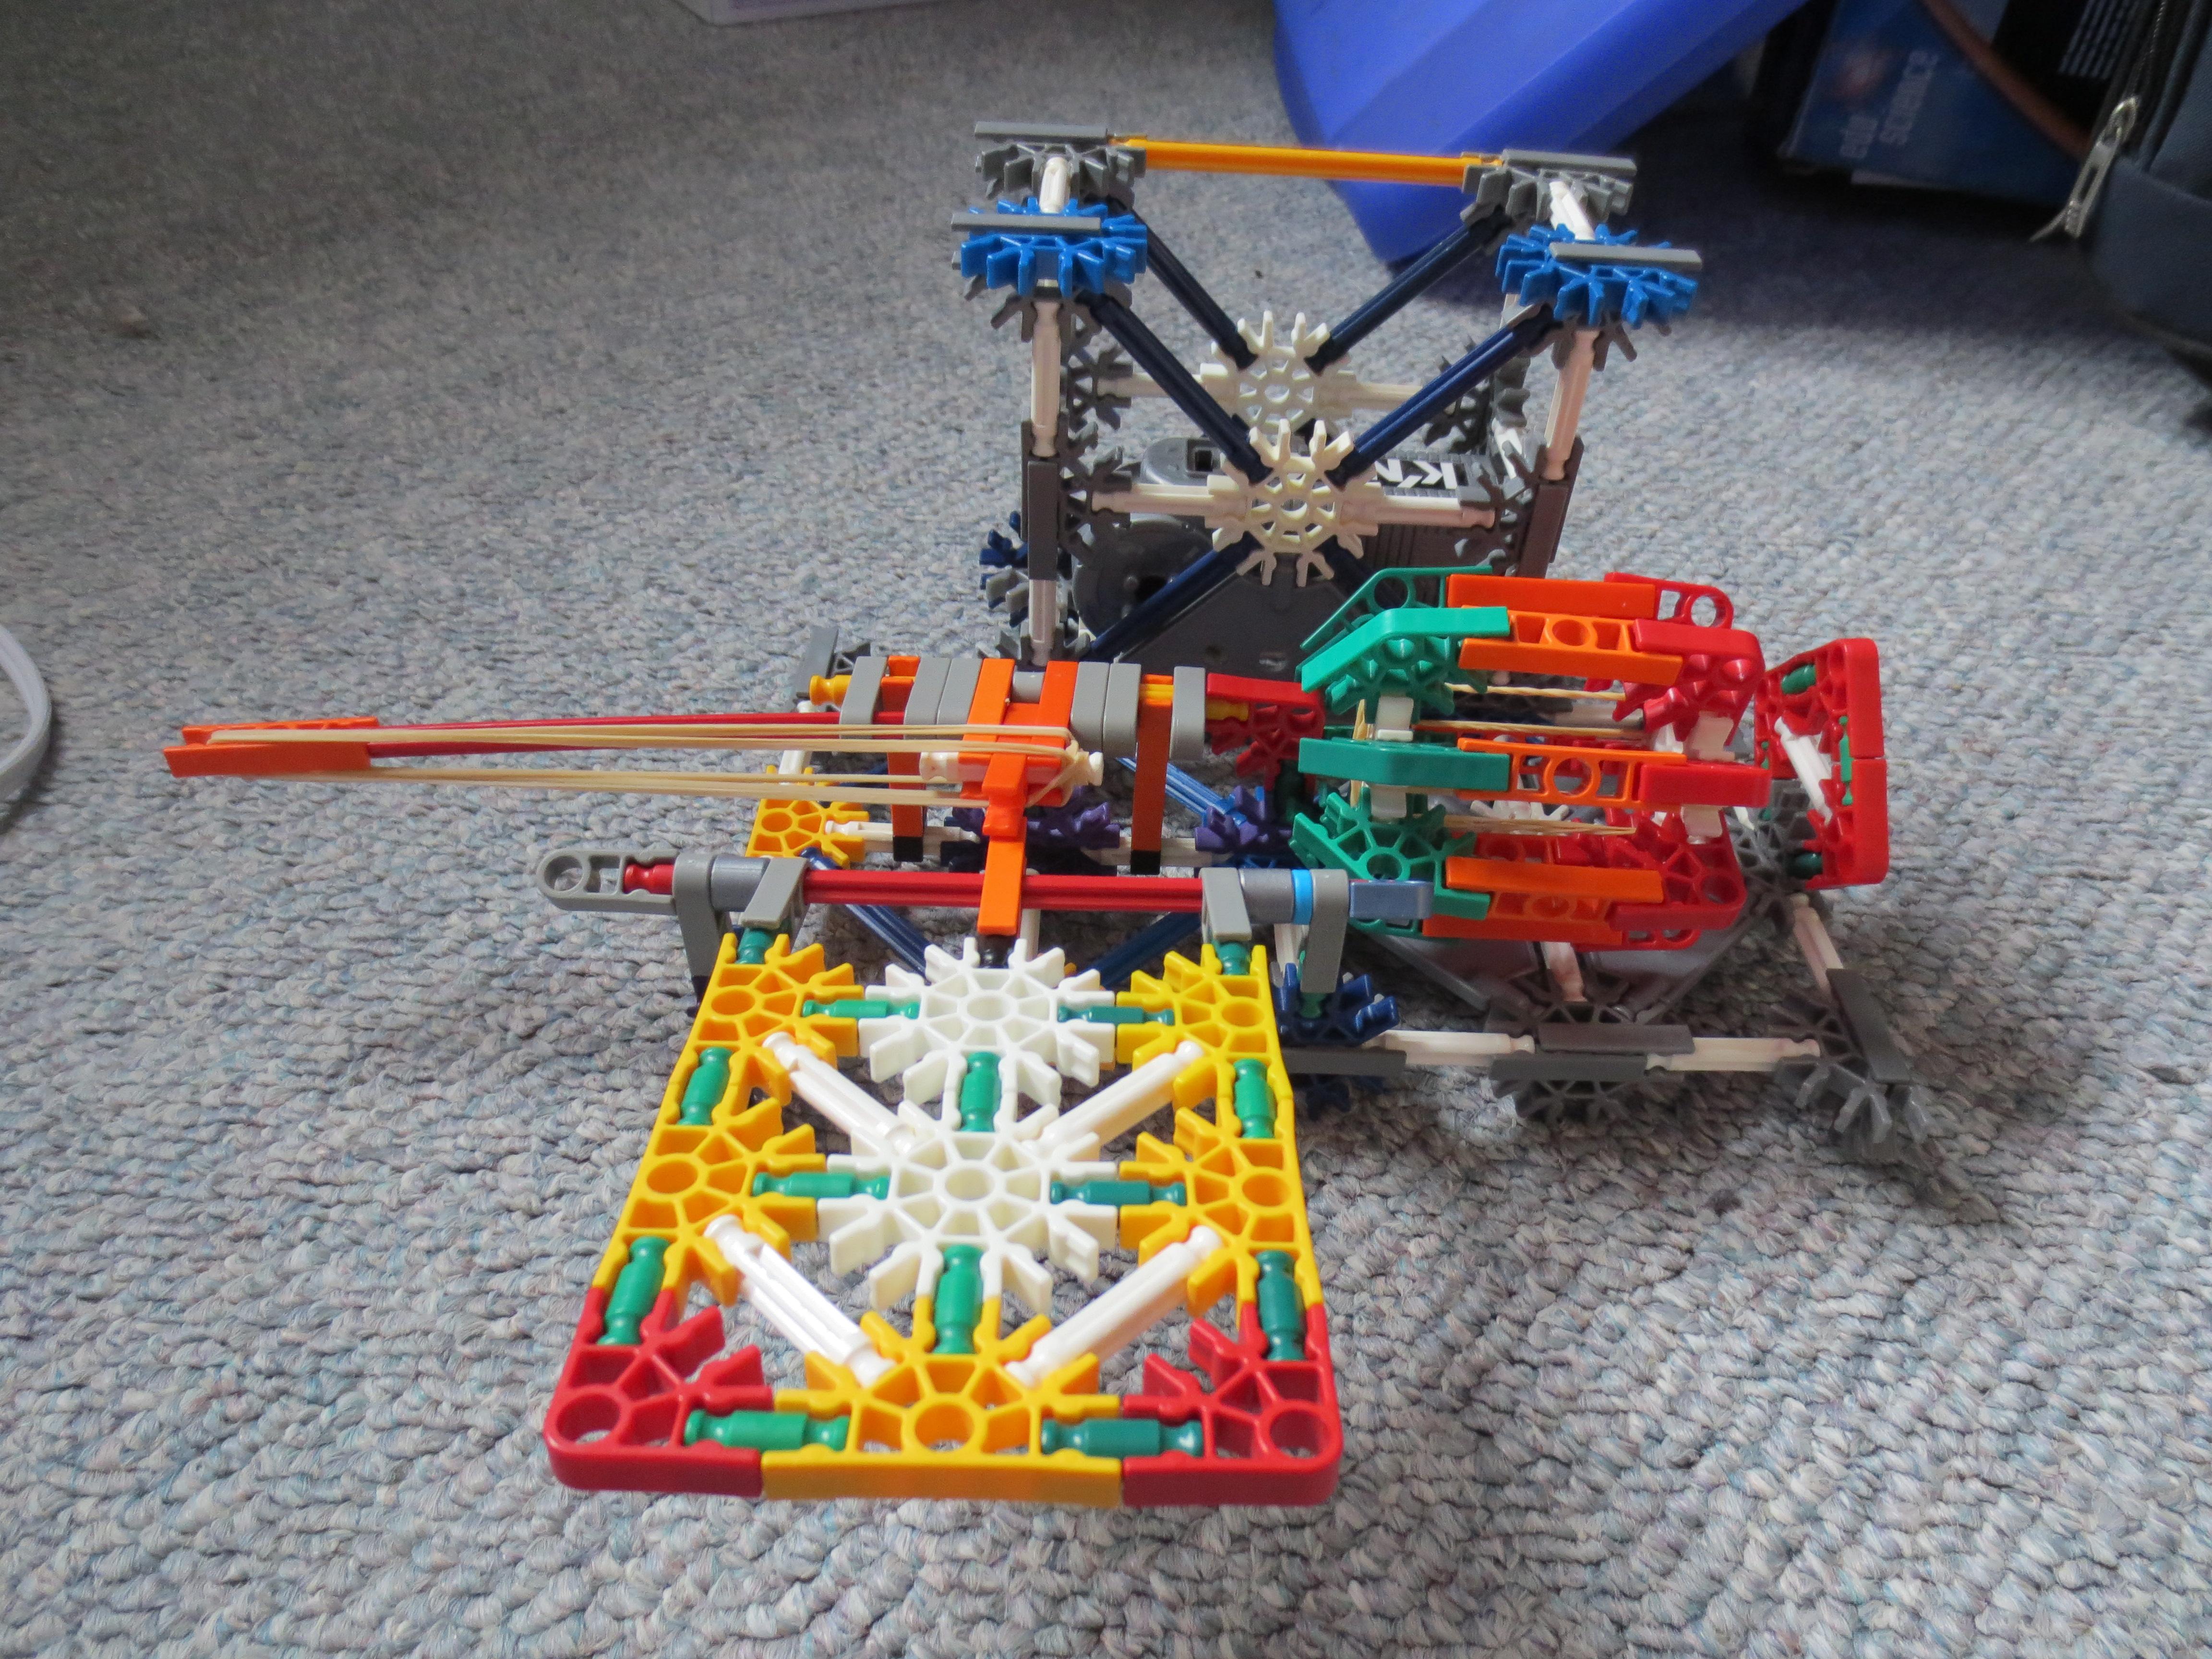 Knex Pedal Activated Landmine